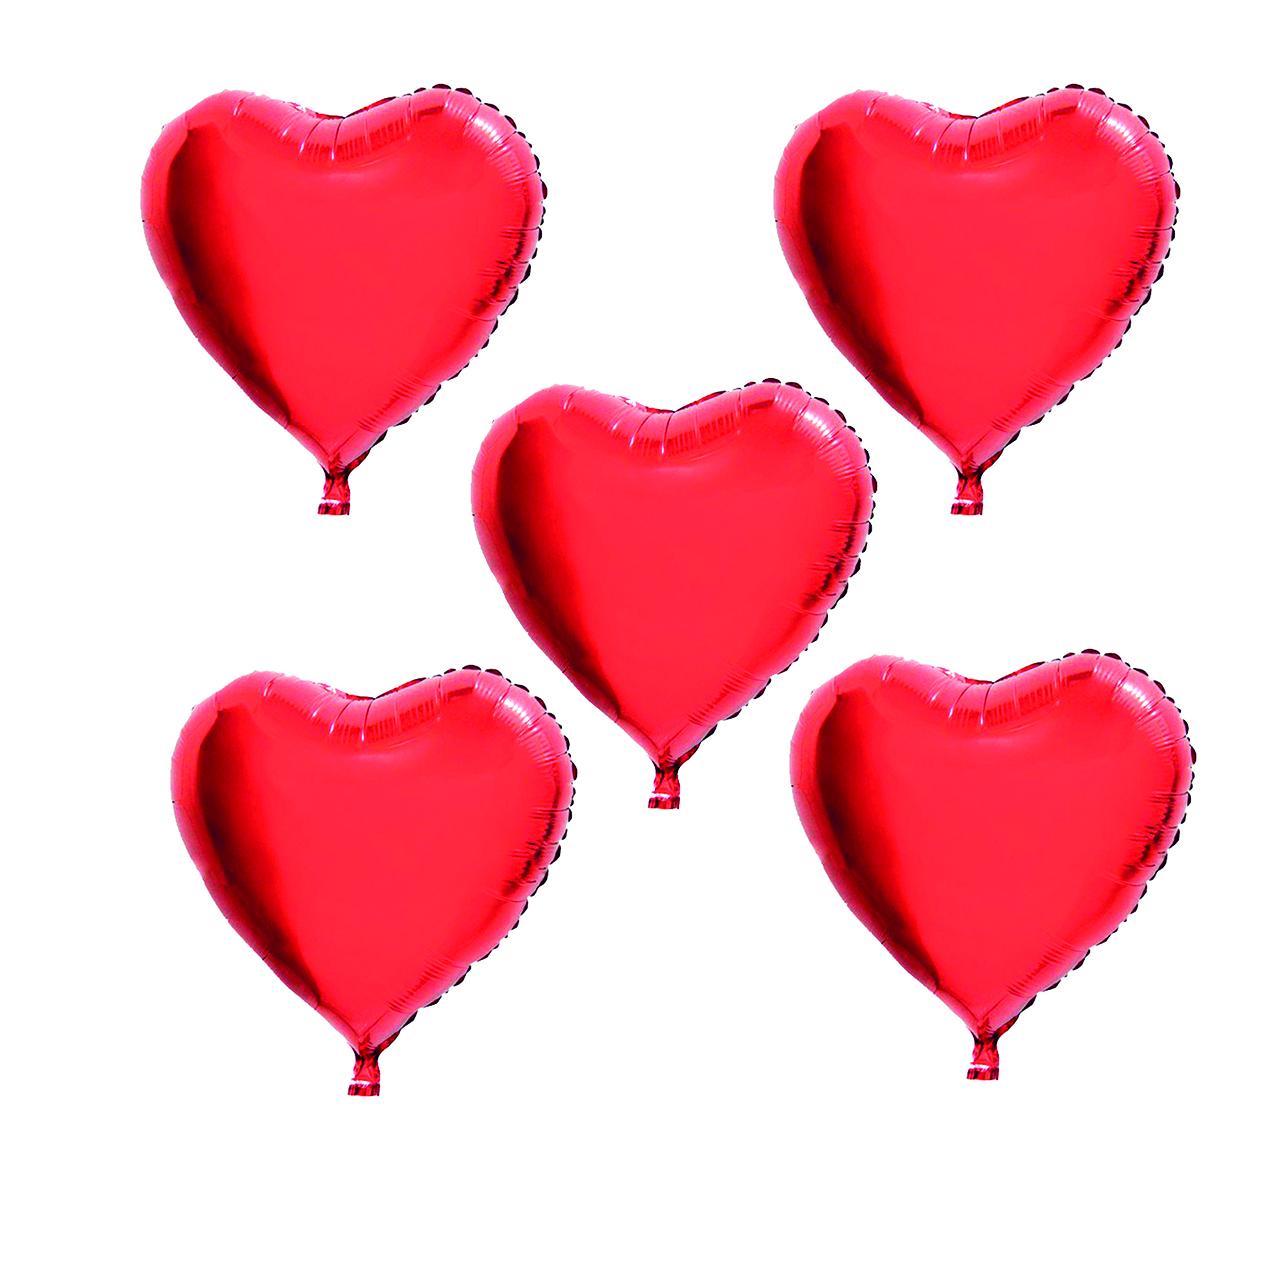 بادکنک فویلی هپی بری طرح قلب ساده بسته 5 عددی